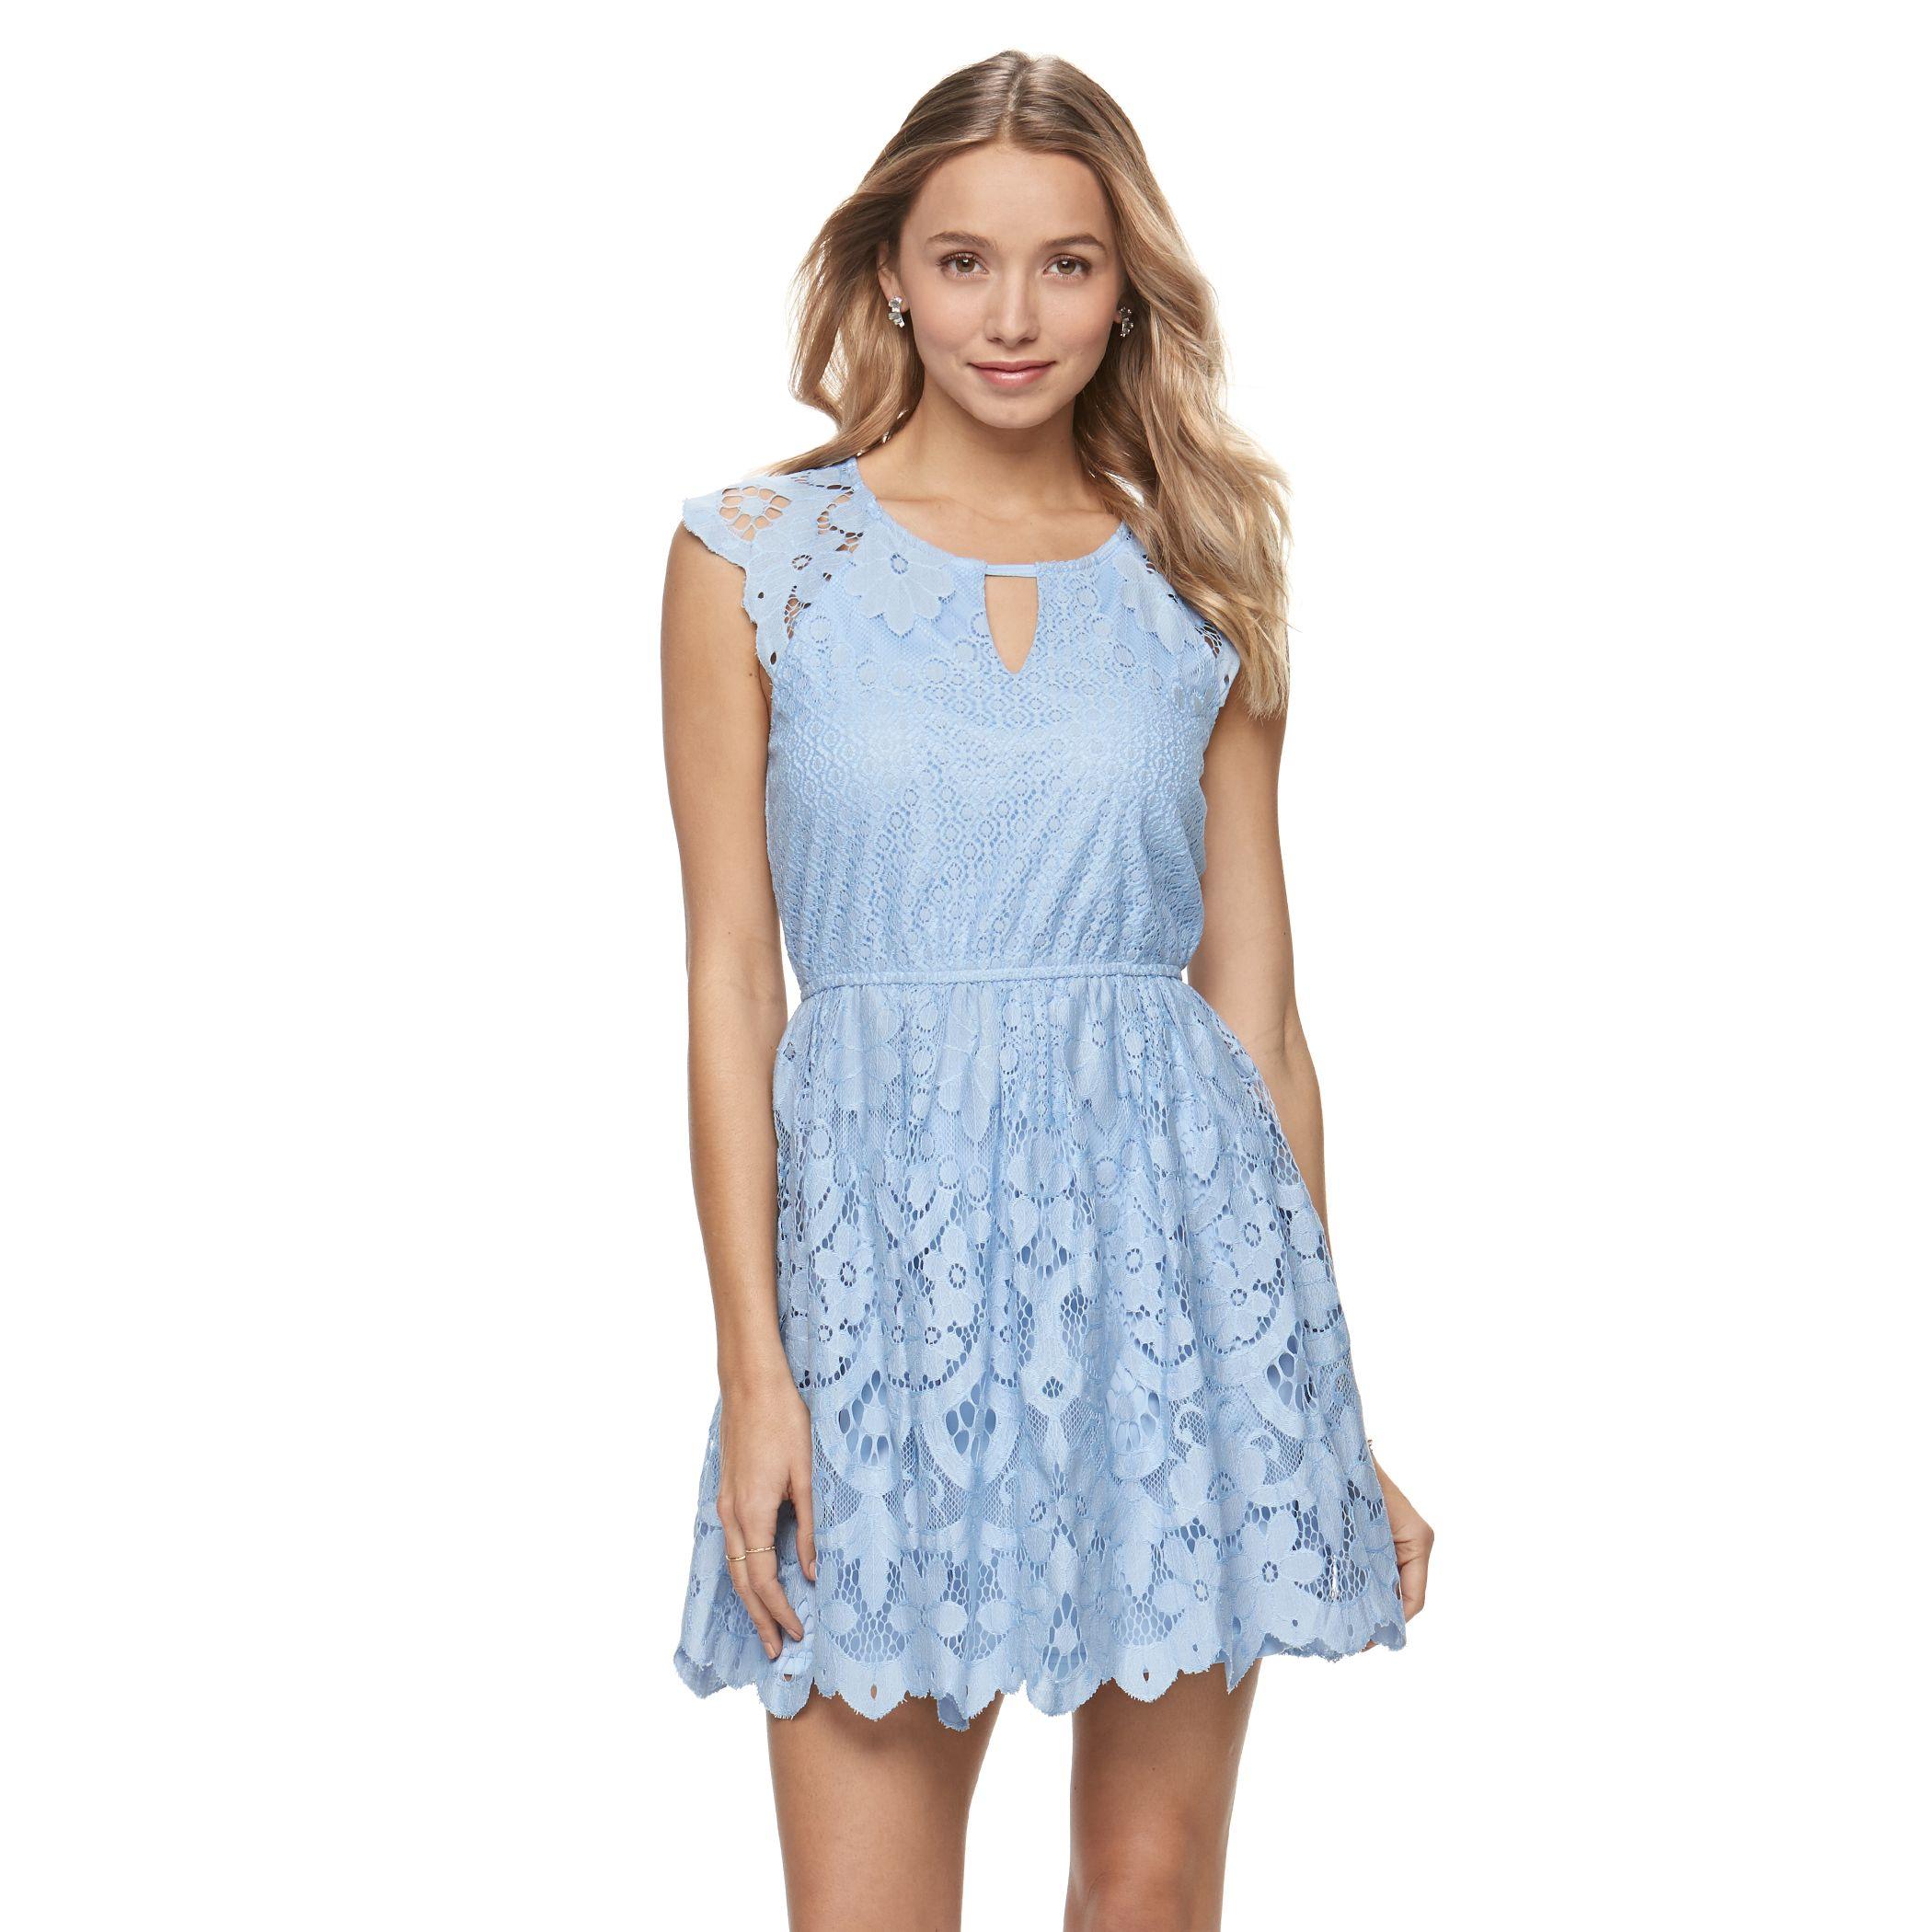 Cheap long formal dresses under 30 dollars